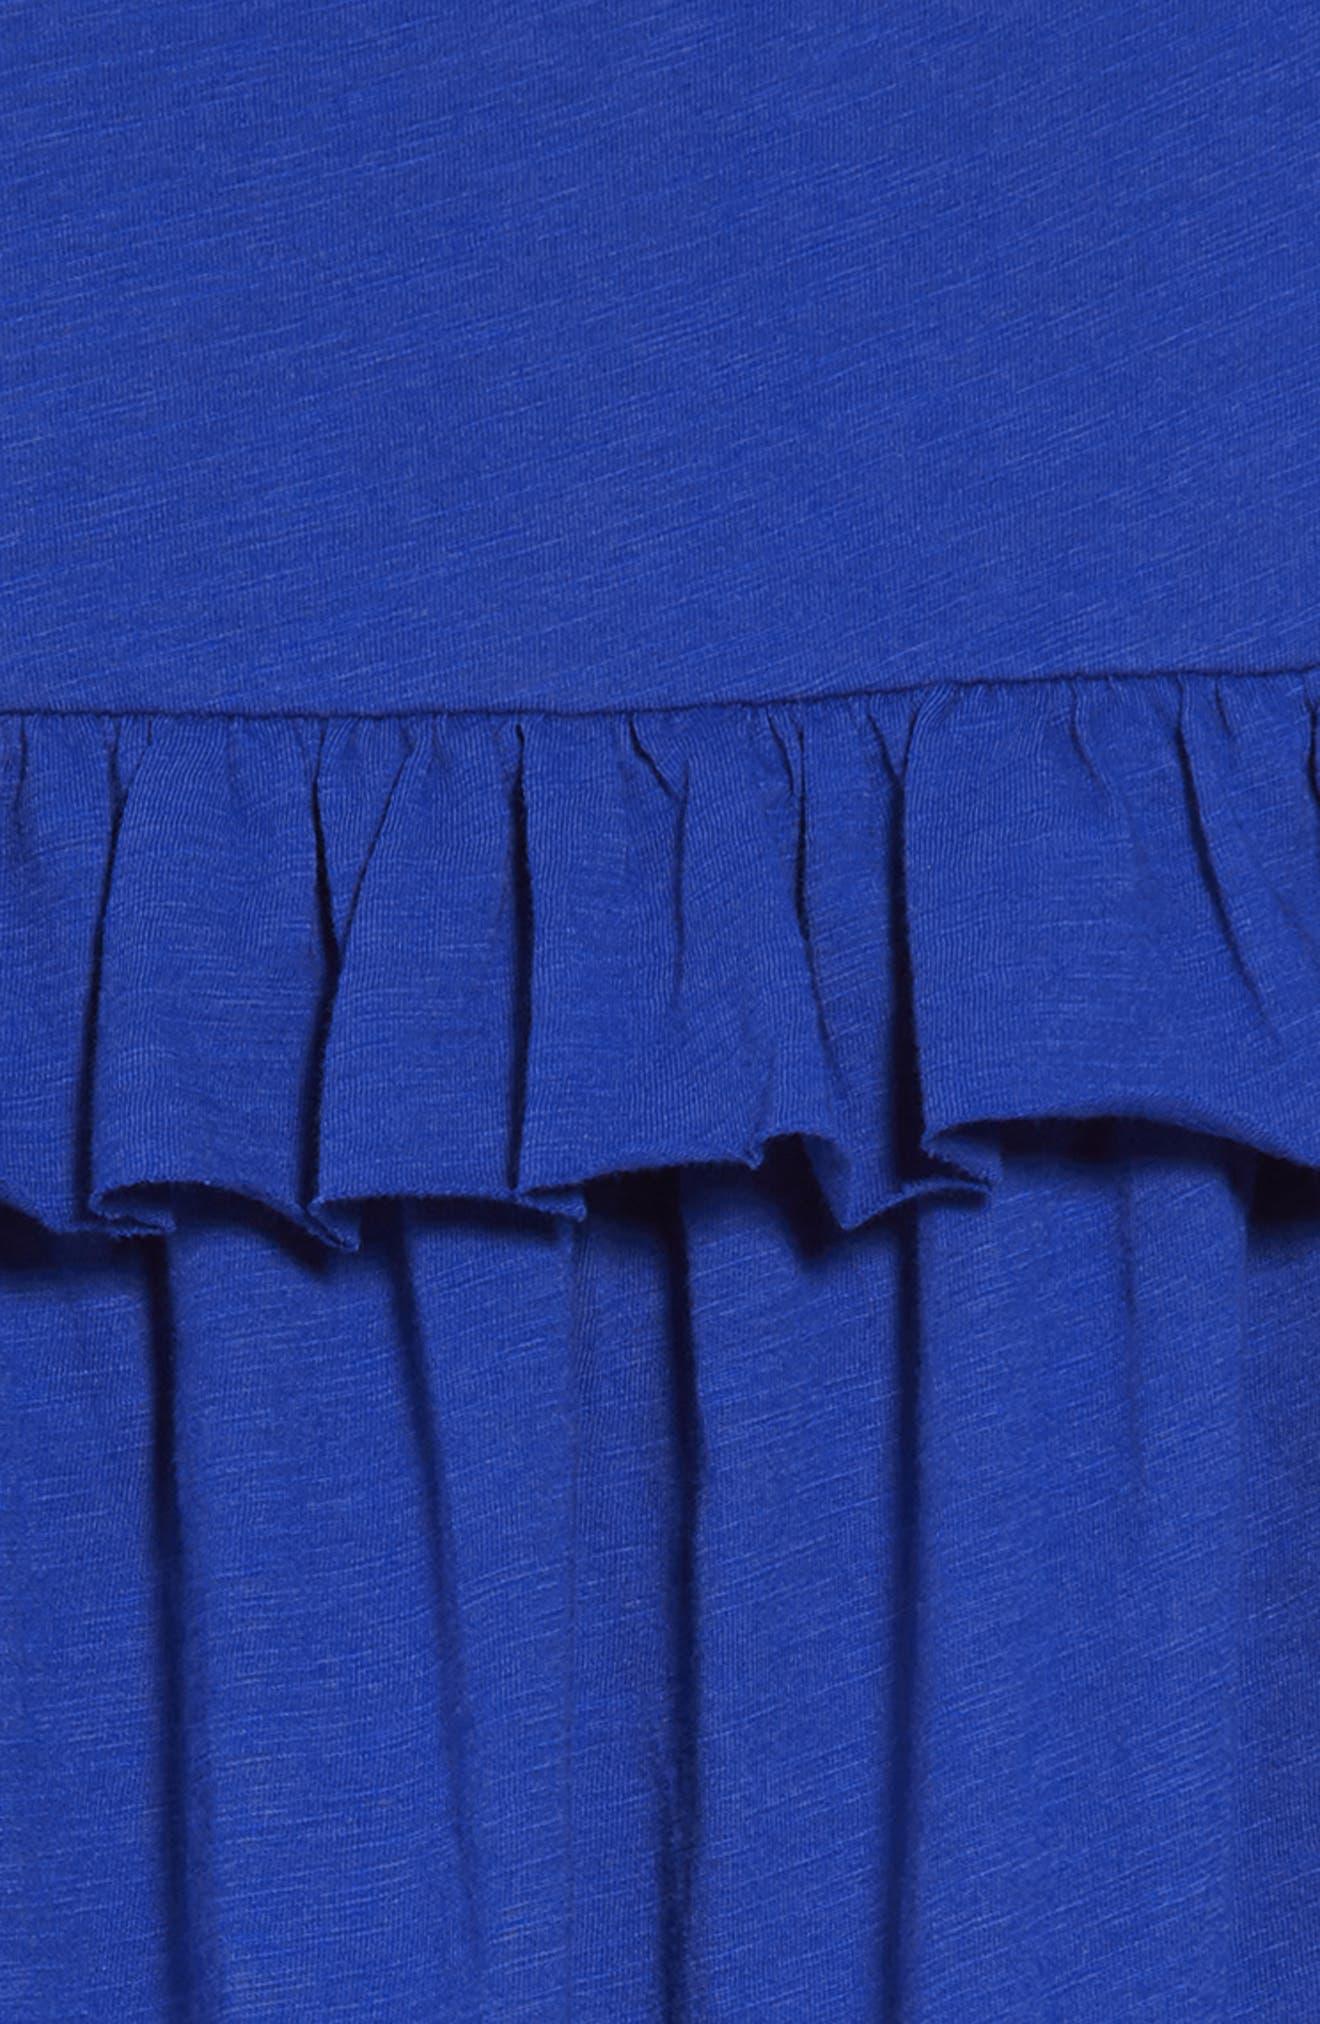 CREWCUTS BY J.CREW,                             Mimi Ruffle Dress,                             Alternate thumbnail 3, color,                             400